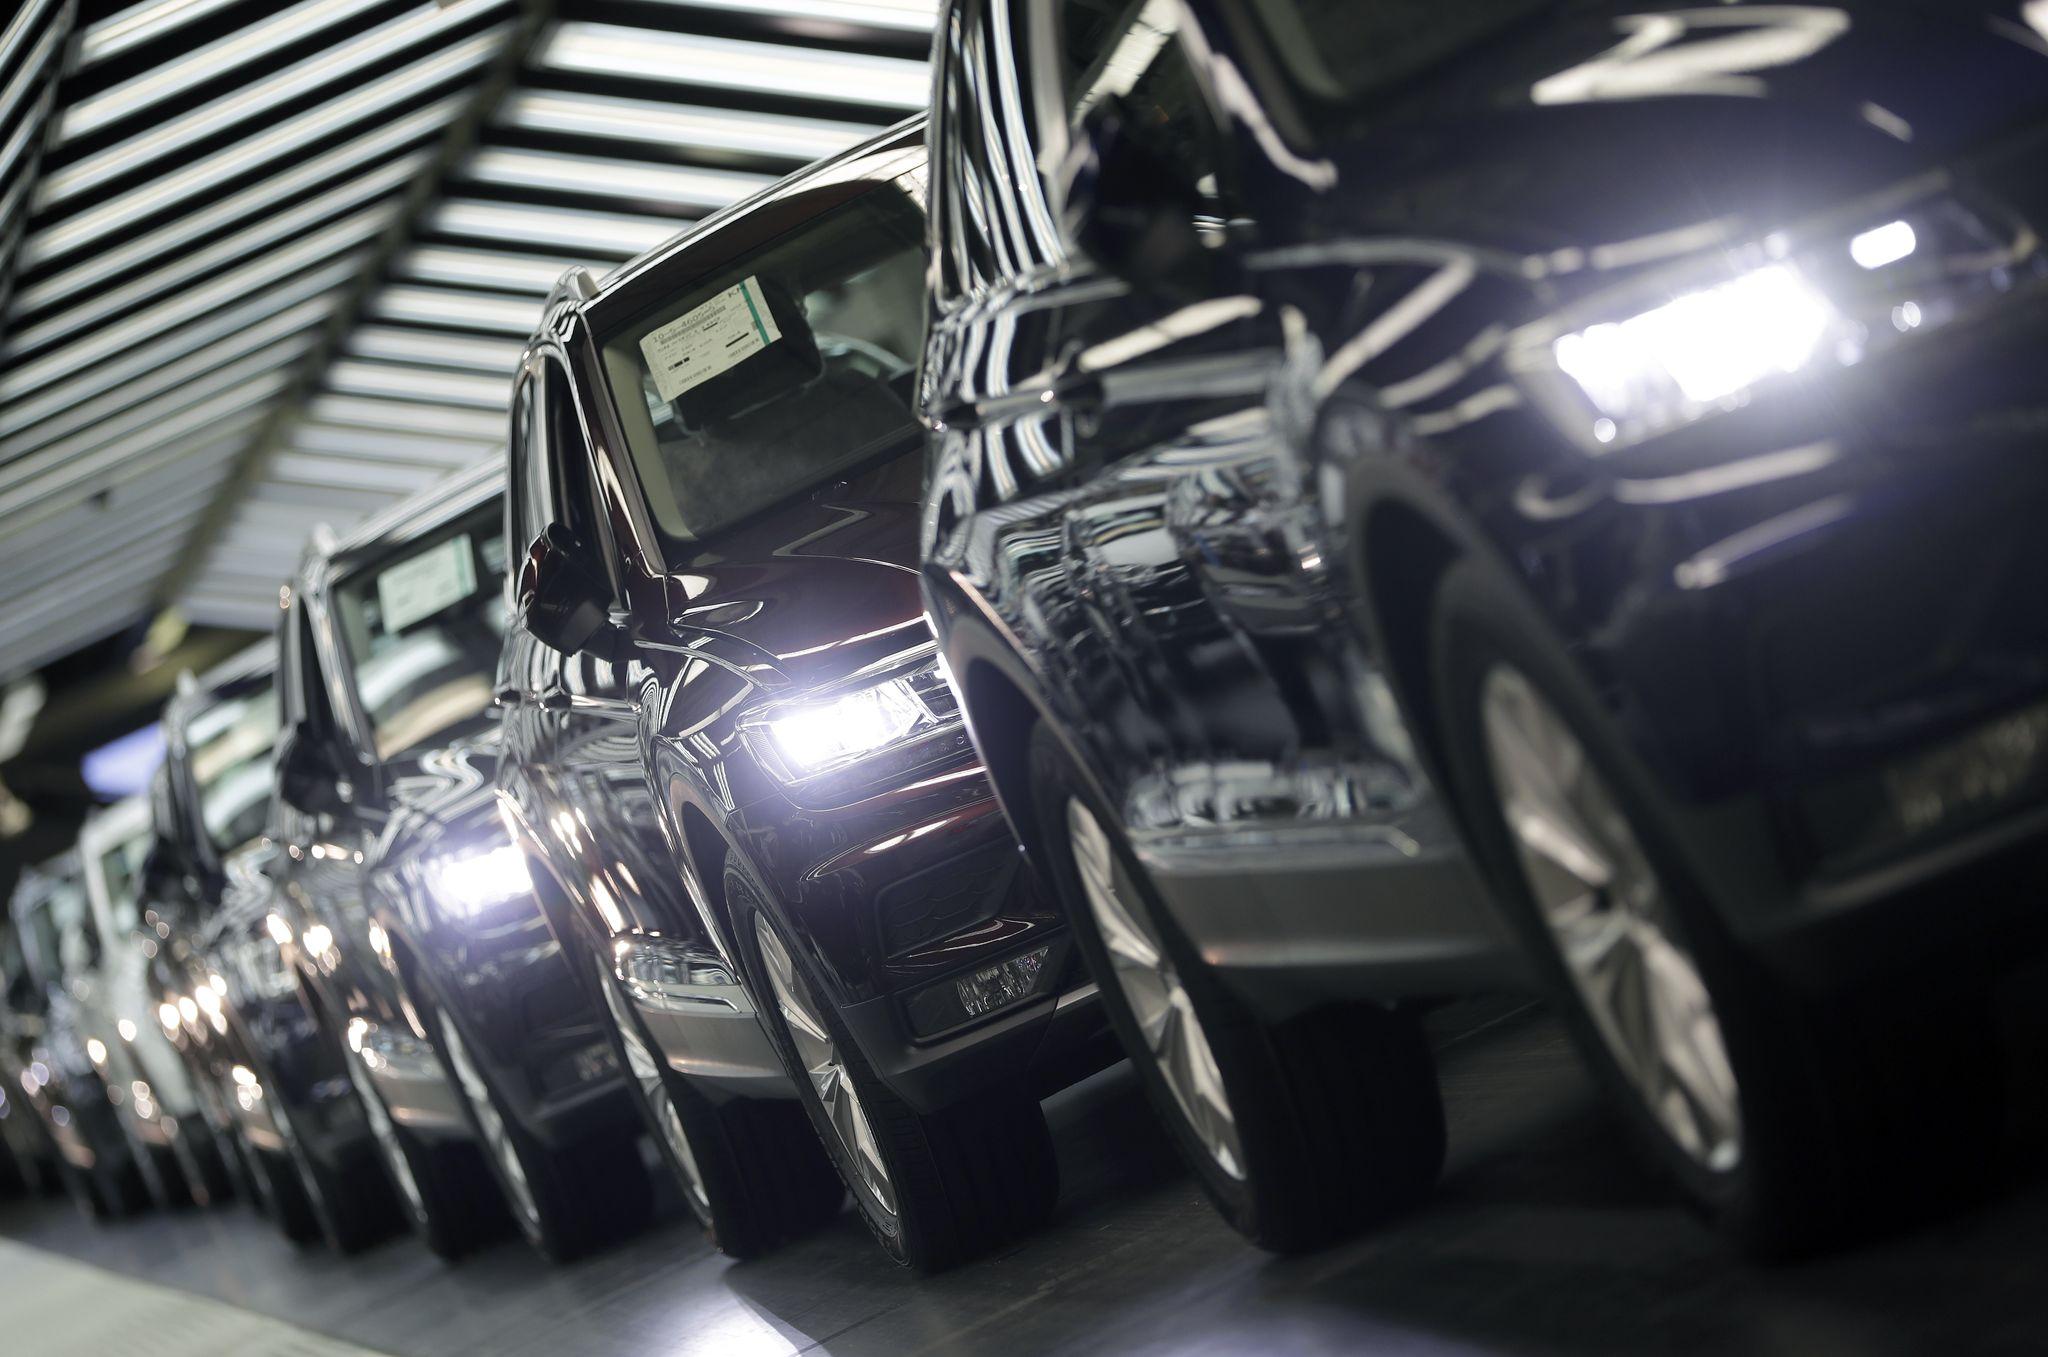 EU warns Trump against auto tariffs, says retaliation would be 'swift'